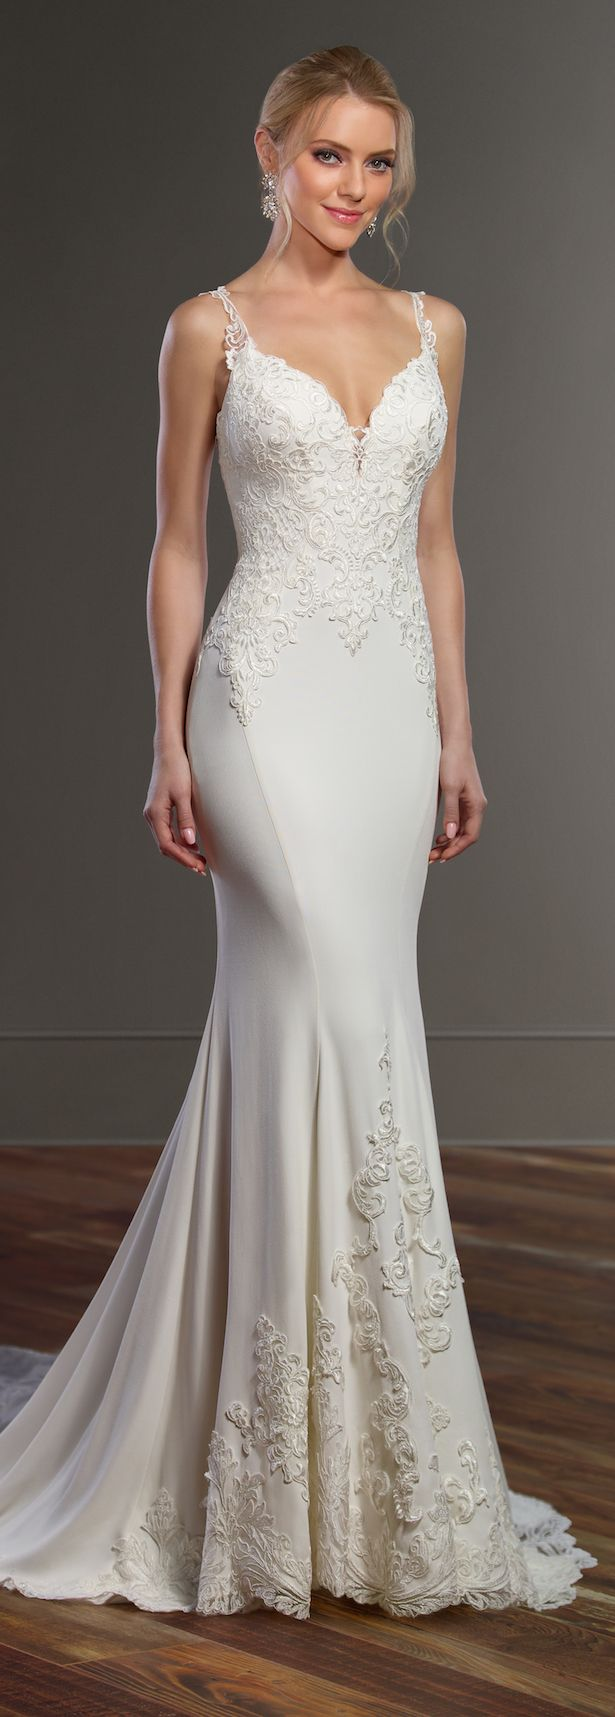 Wedding-Dresses-0713